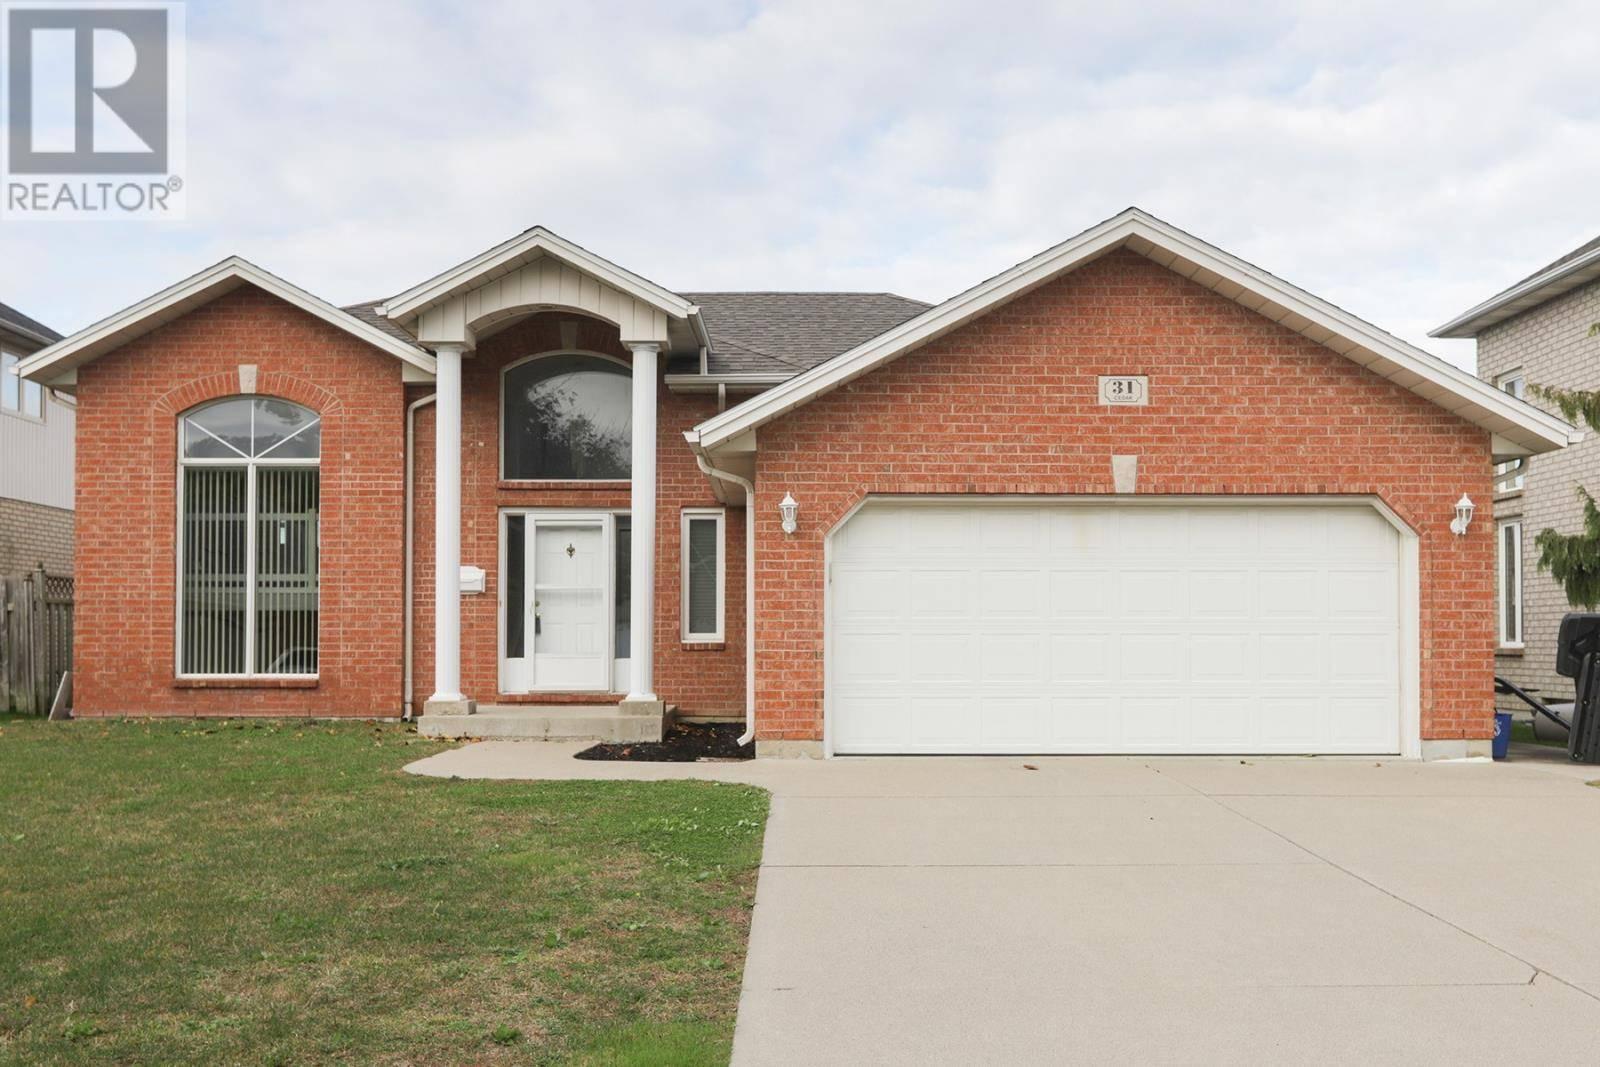 House for sale at 31 Cedar Dr Leamington Ontario - MLS: 19027642